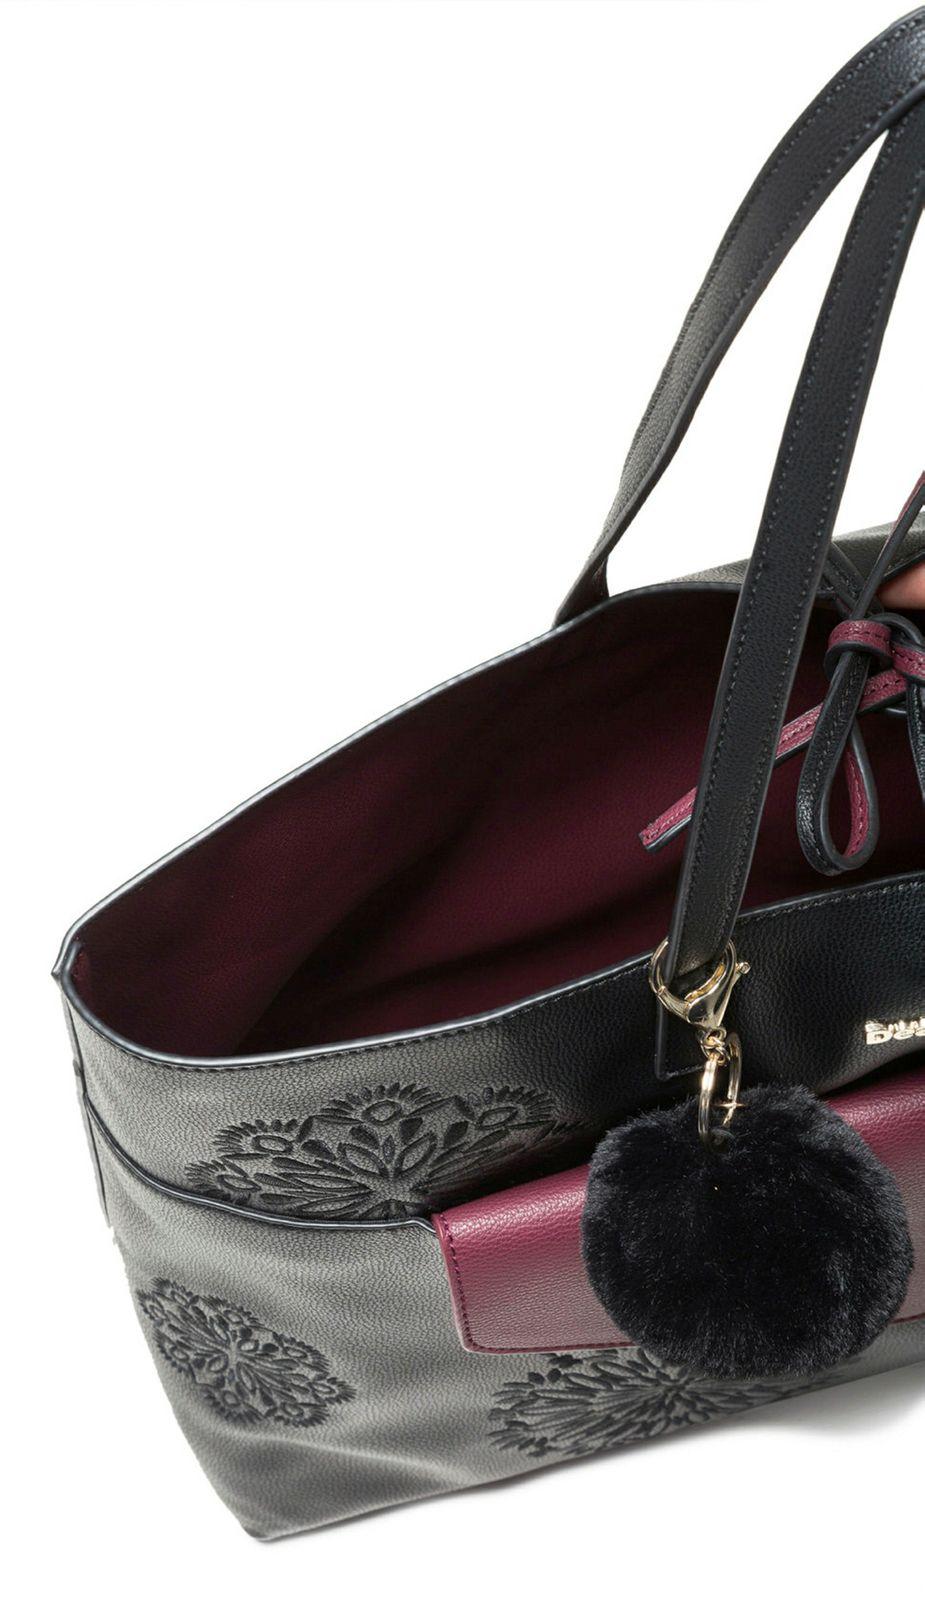 c00d8862a8 Desigual Aleida Seattle Wallet Shoulder Bag Schultertasche Clutch ...